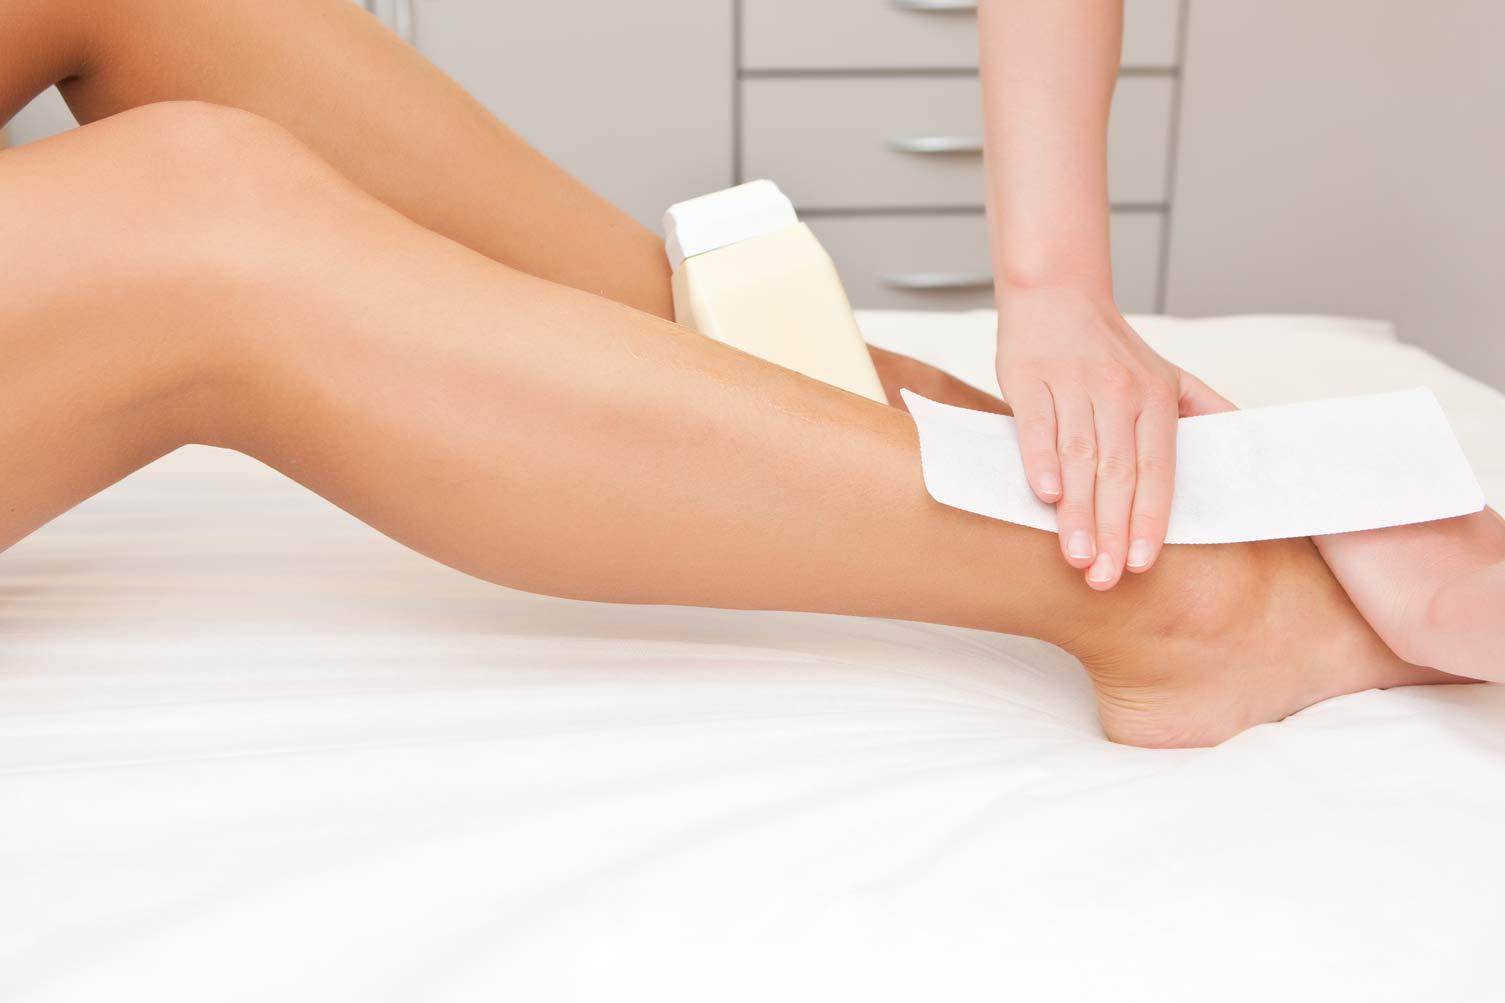 Full Leg Wax At Metamorphosis Day Spa in NYC